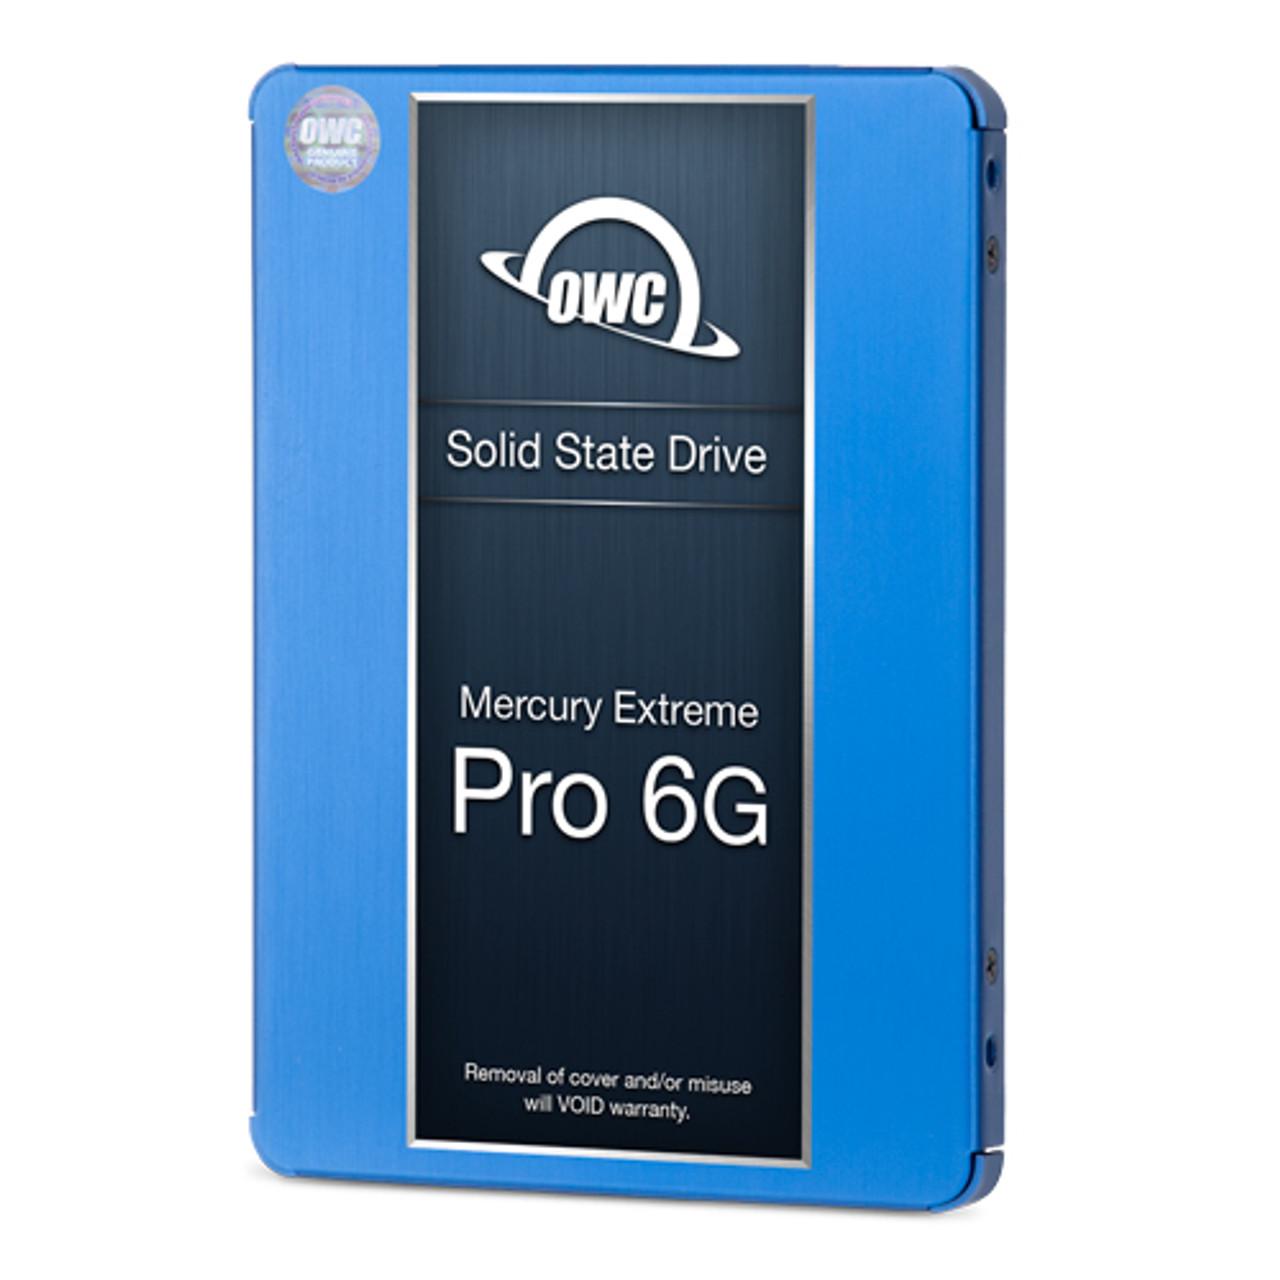 480GB OWC Mercury Extreme 6G SSD - SSD Bay Add-In Kit for 2011 21.5-inch iMacs